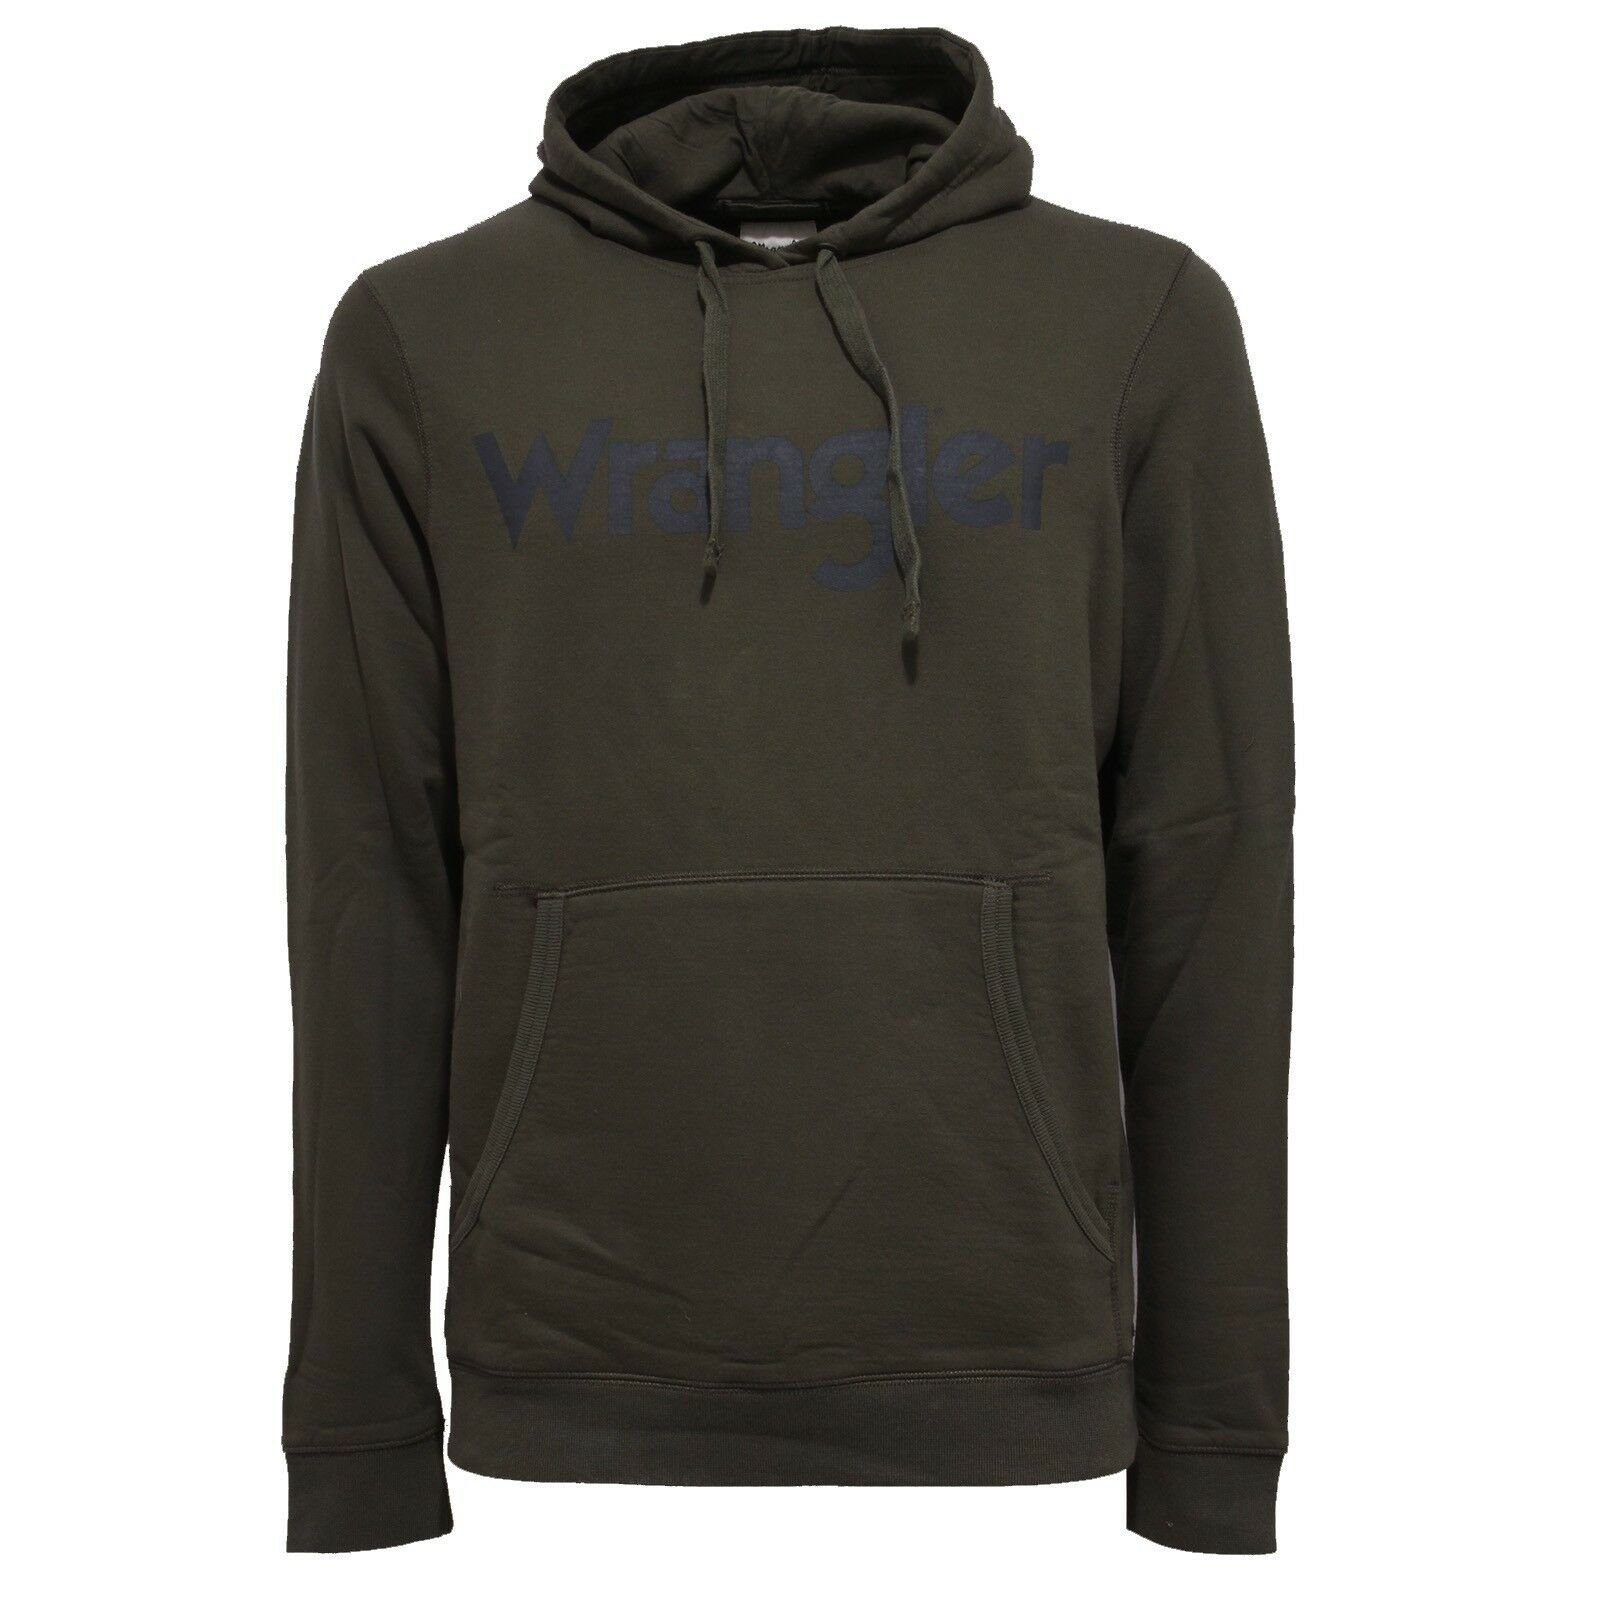 9900X felpa uomo WRANGLER military verde cotton sweatshirt man